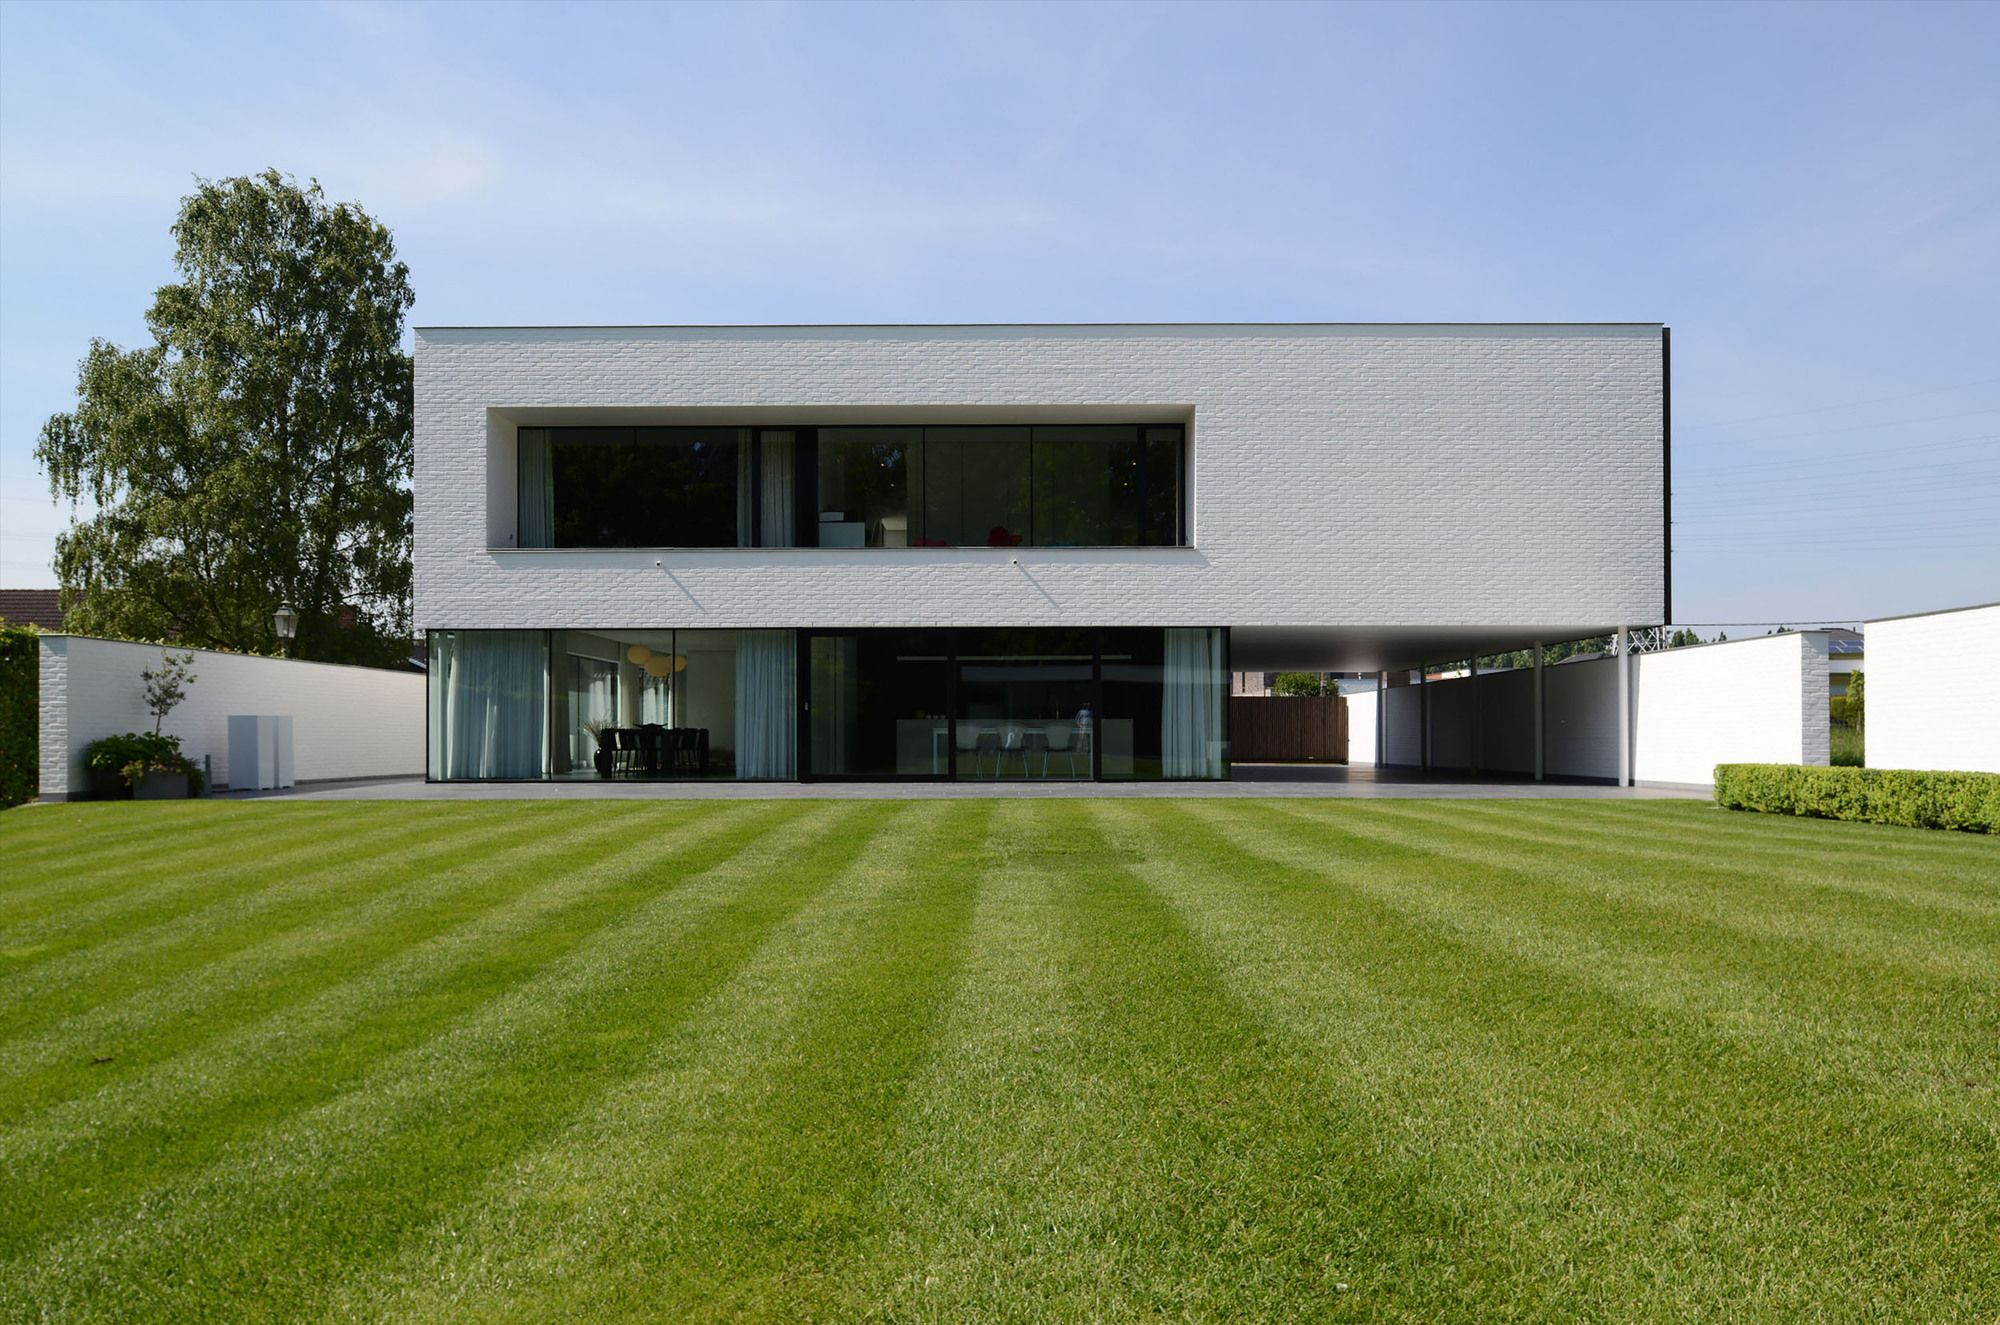 Impressionnante maison contemporaine flamande au design minimaliste